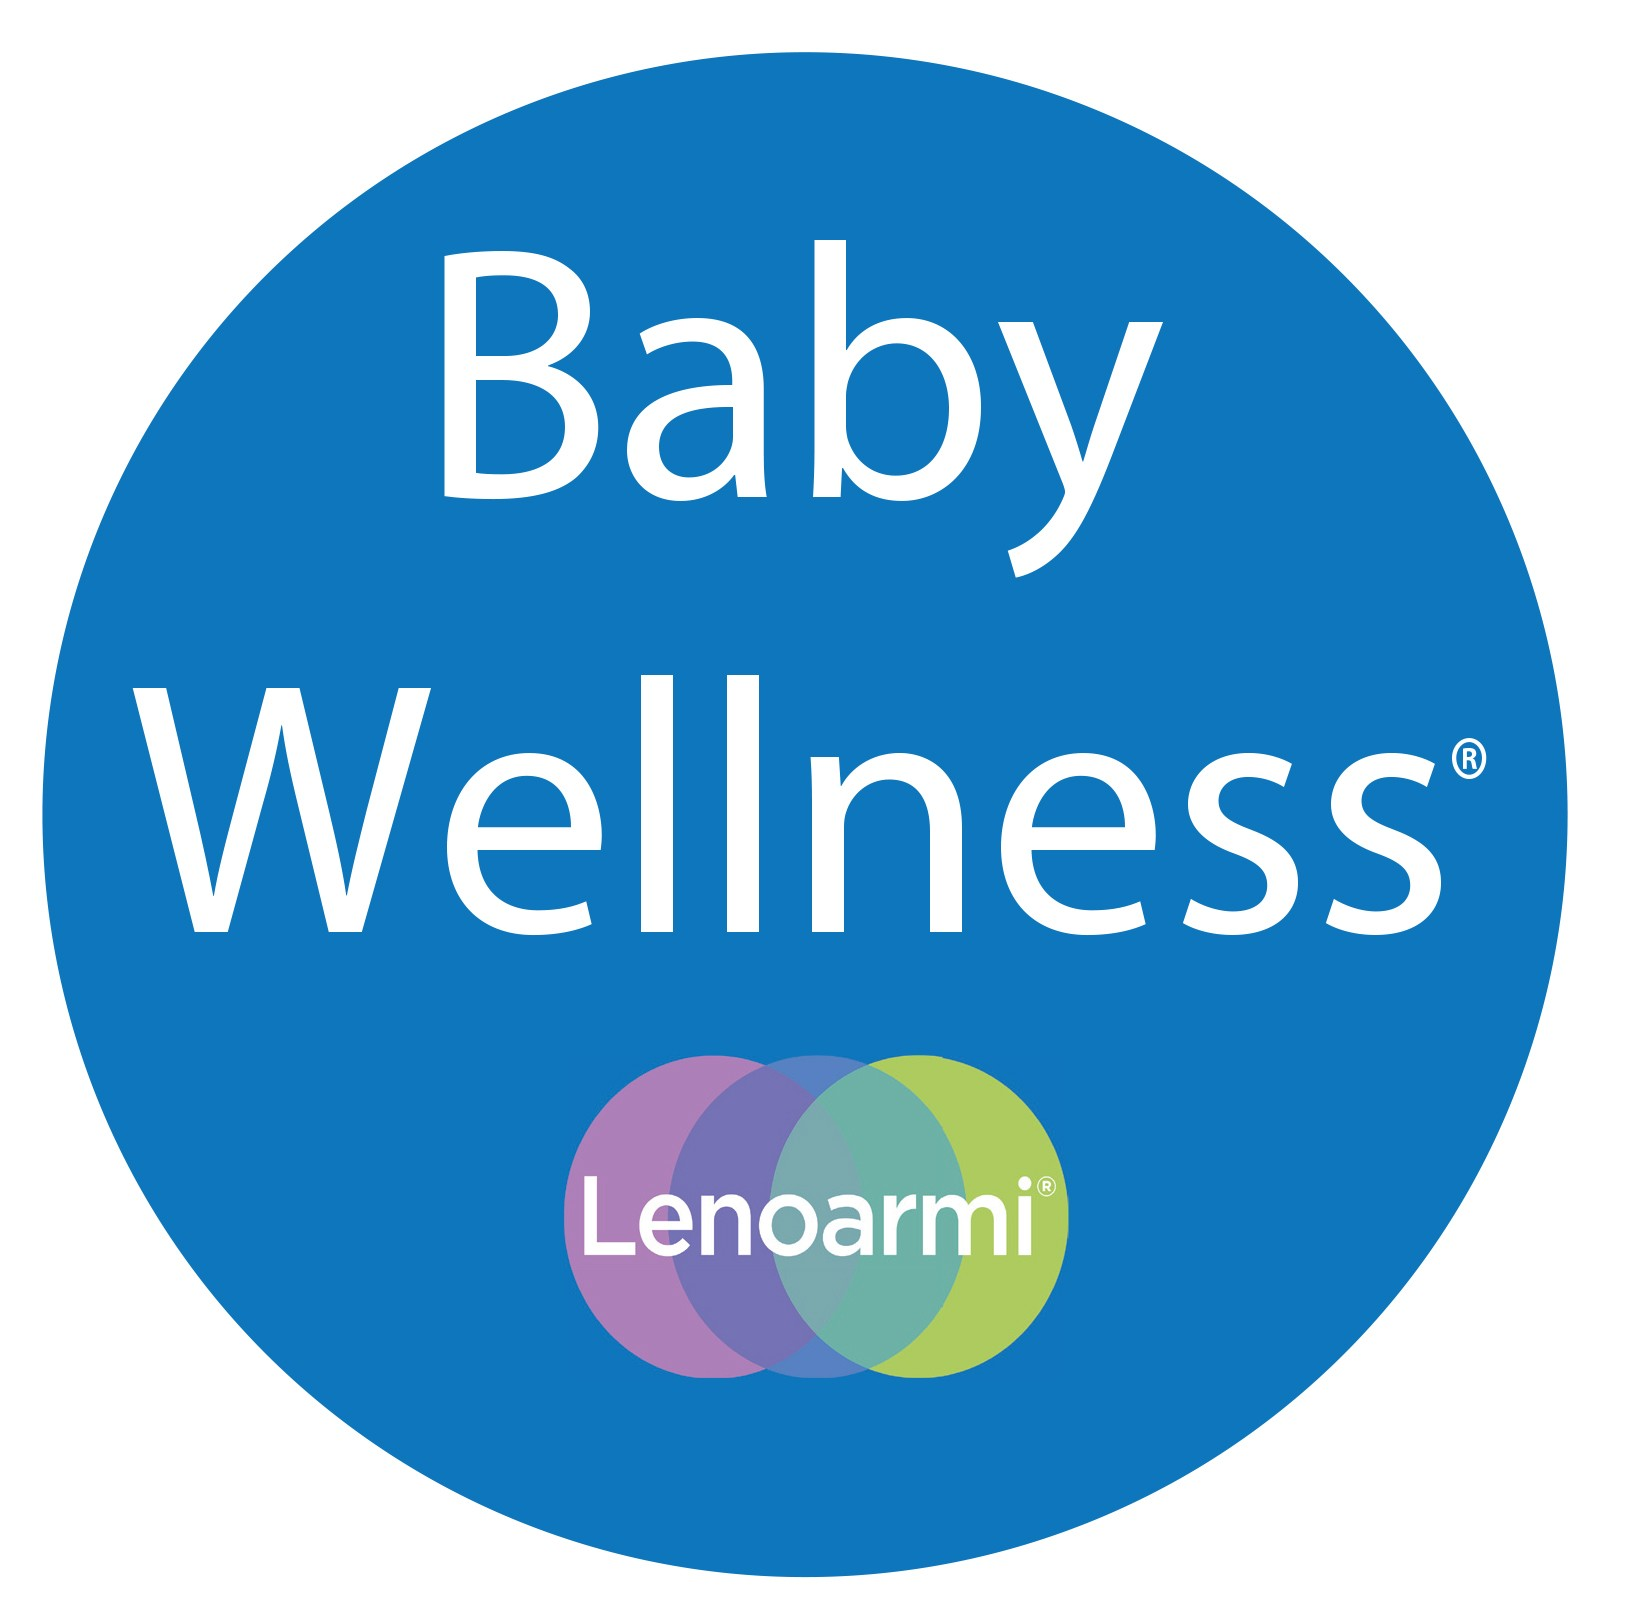 Baby Wellness by Lenoarmi